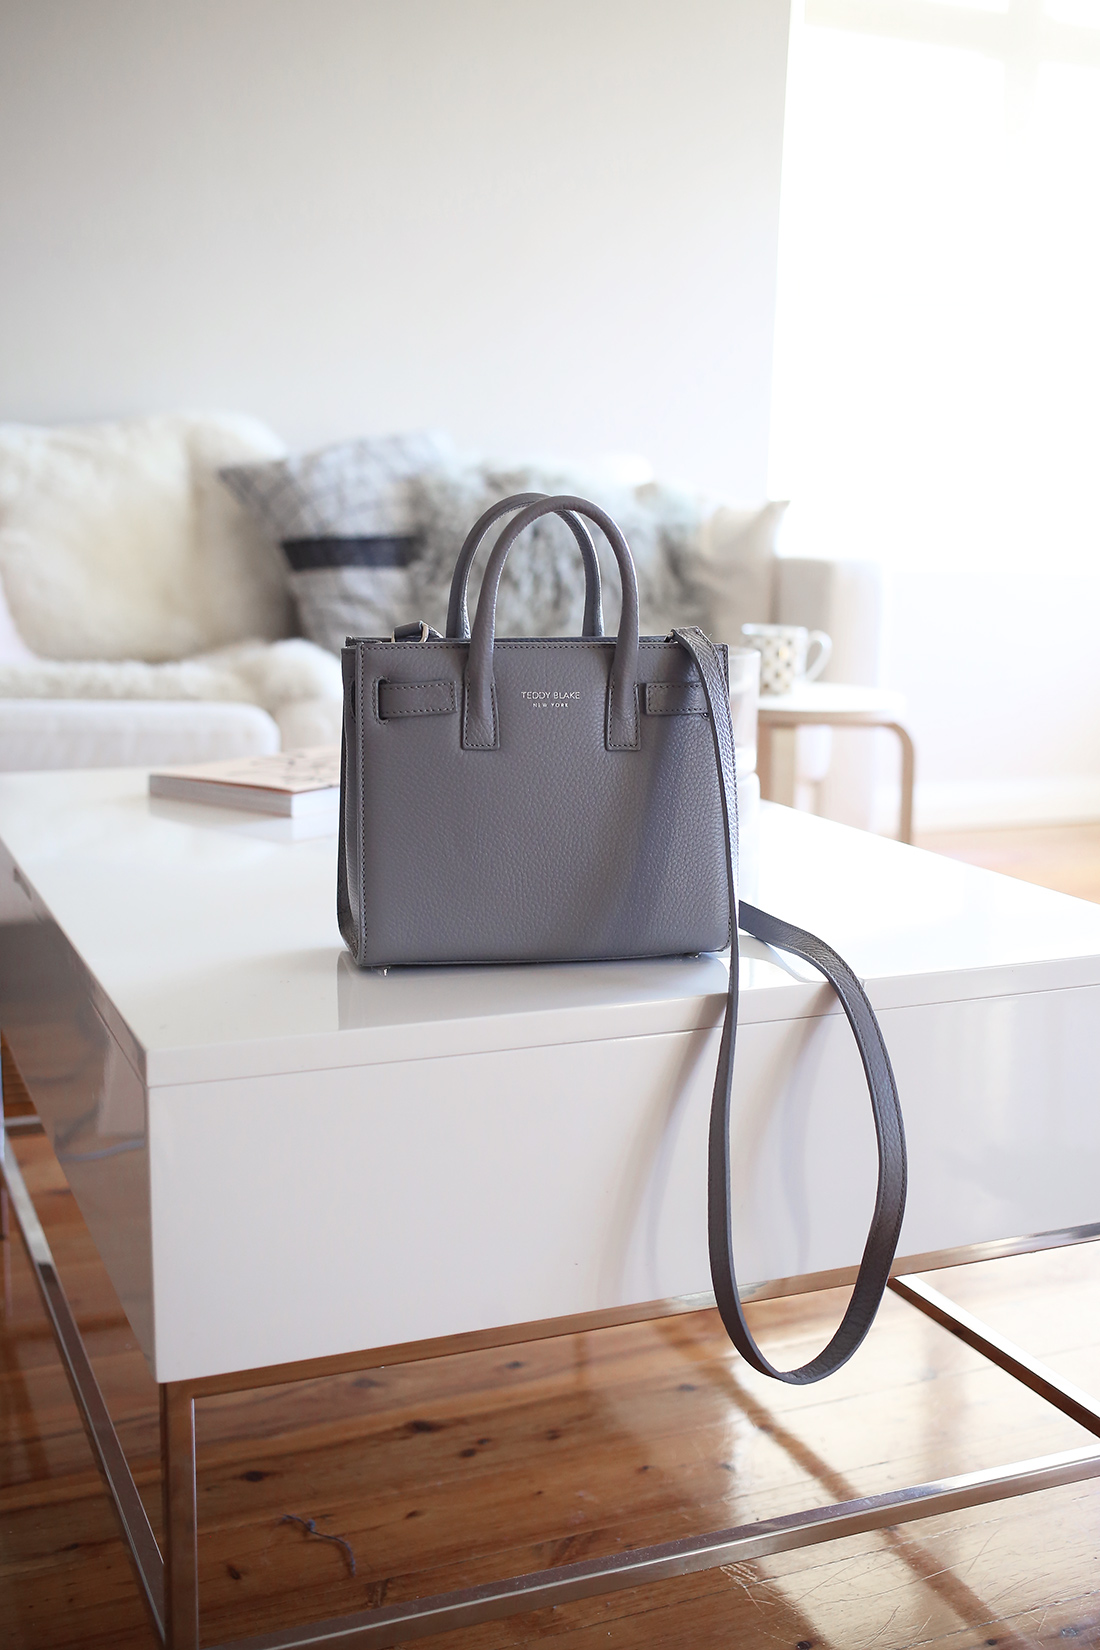 Teddy Blake Carla Nano Handbag Review